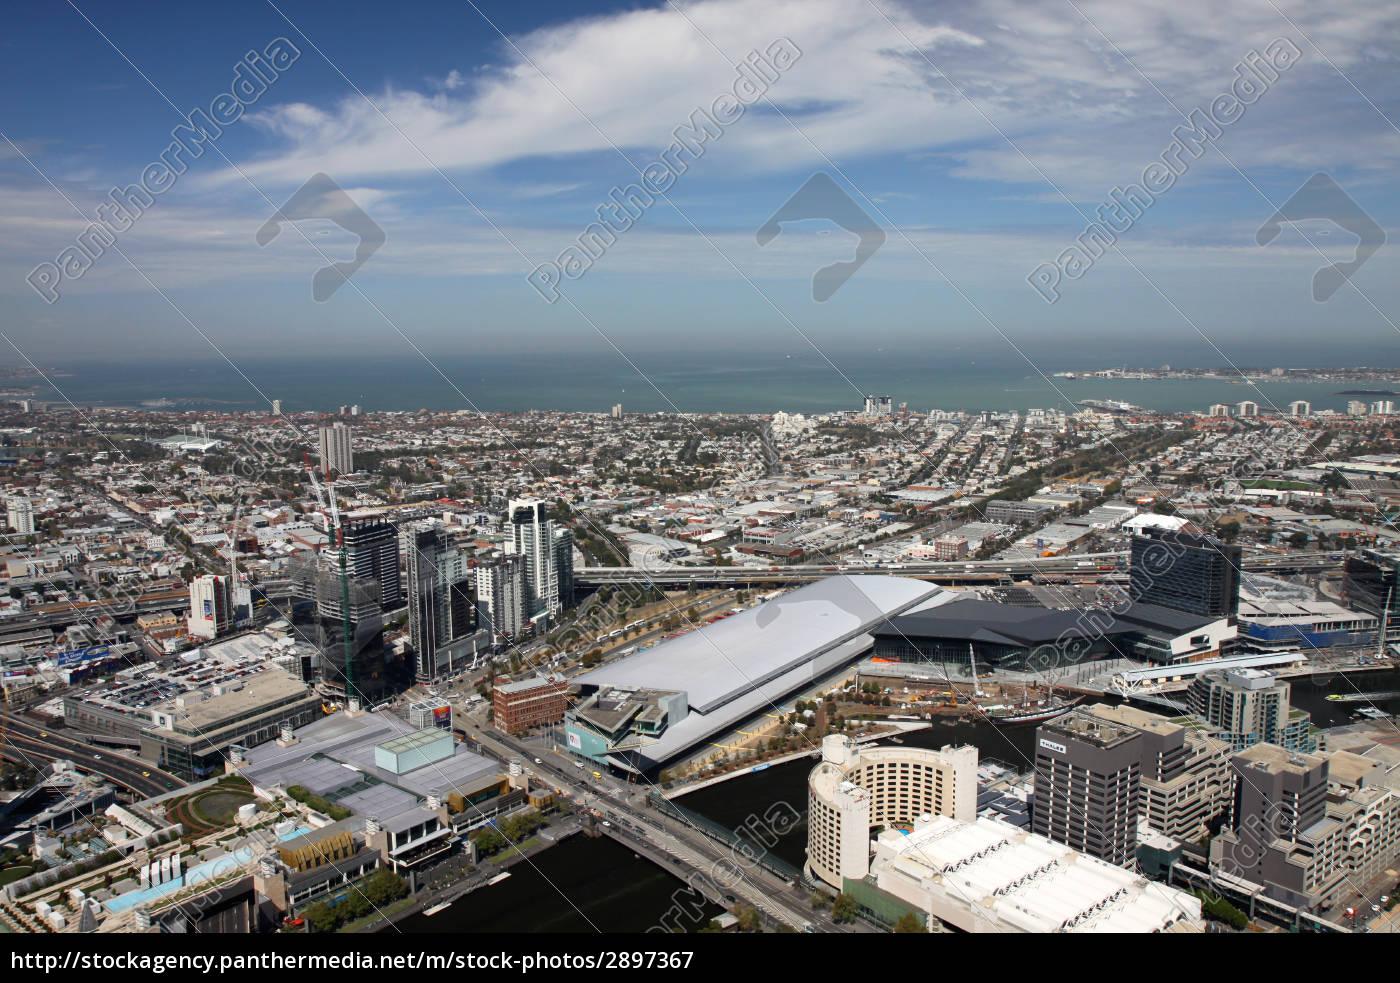 house, building, multistory building, multistorey building, multi-story building, multi-storey building - 2897367